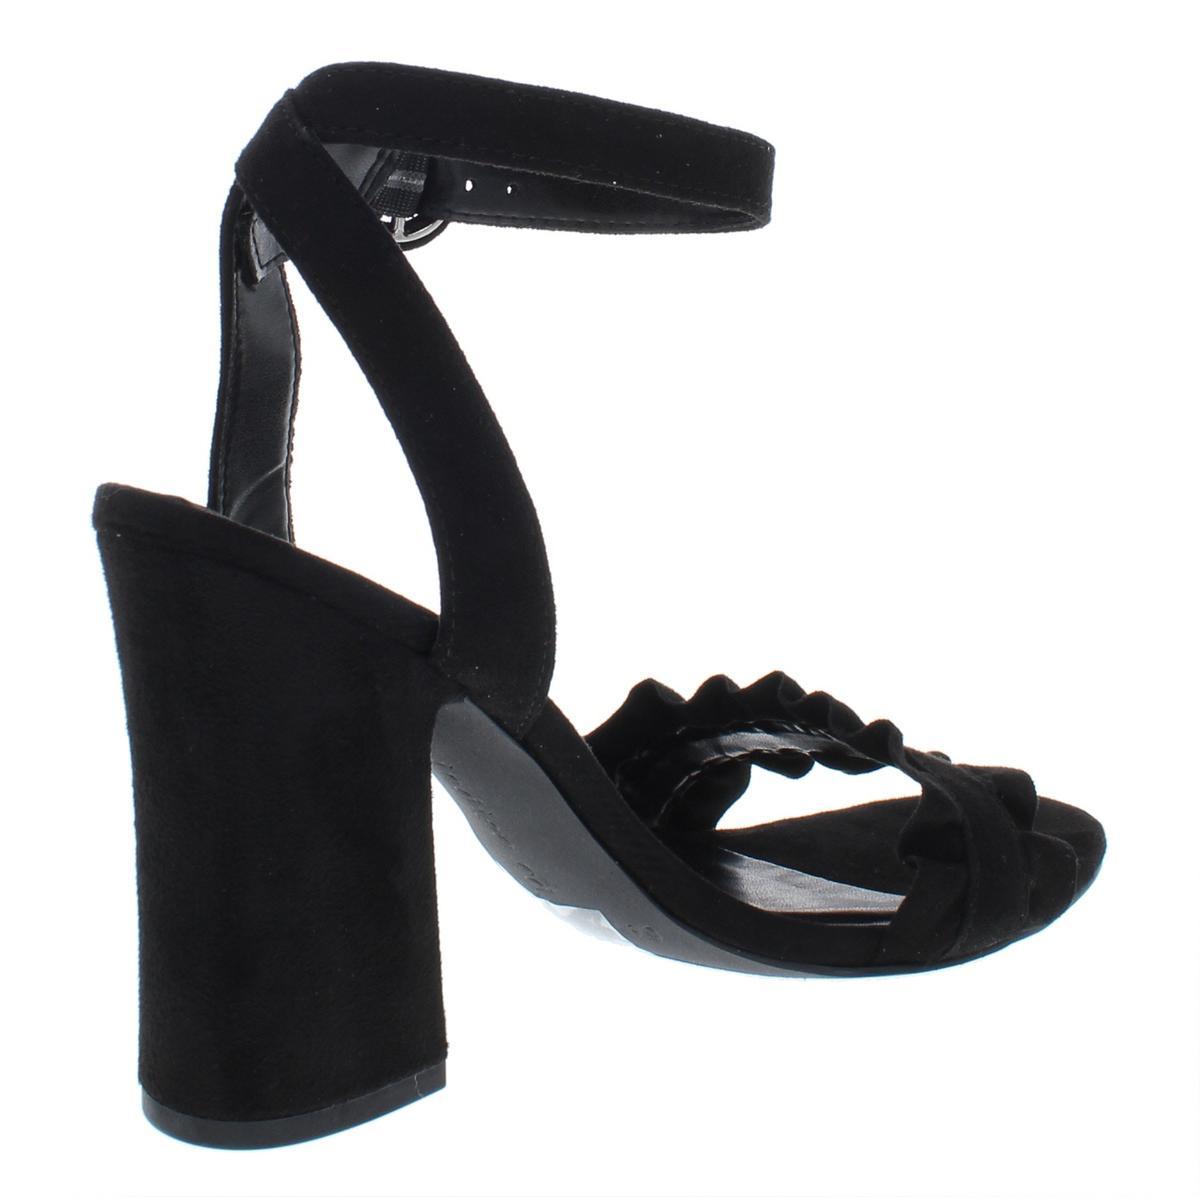 Indigo-Rd-Womens-Sandie-Faux-Suede-Block-Heel-Dress-Sandals-Shoes-BHFO-6802 thumbnail 4